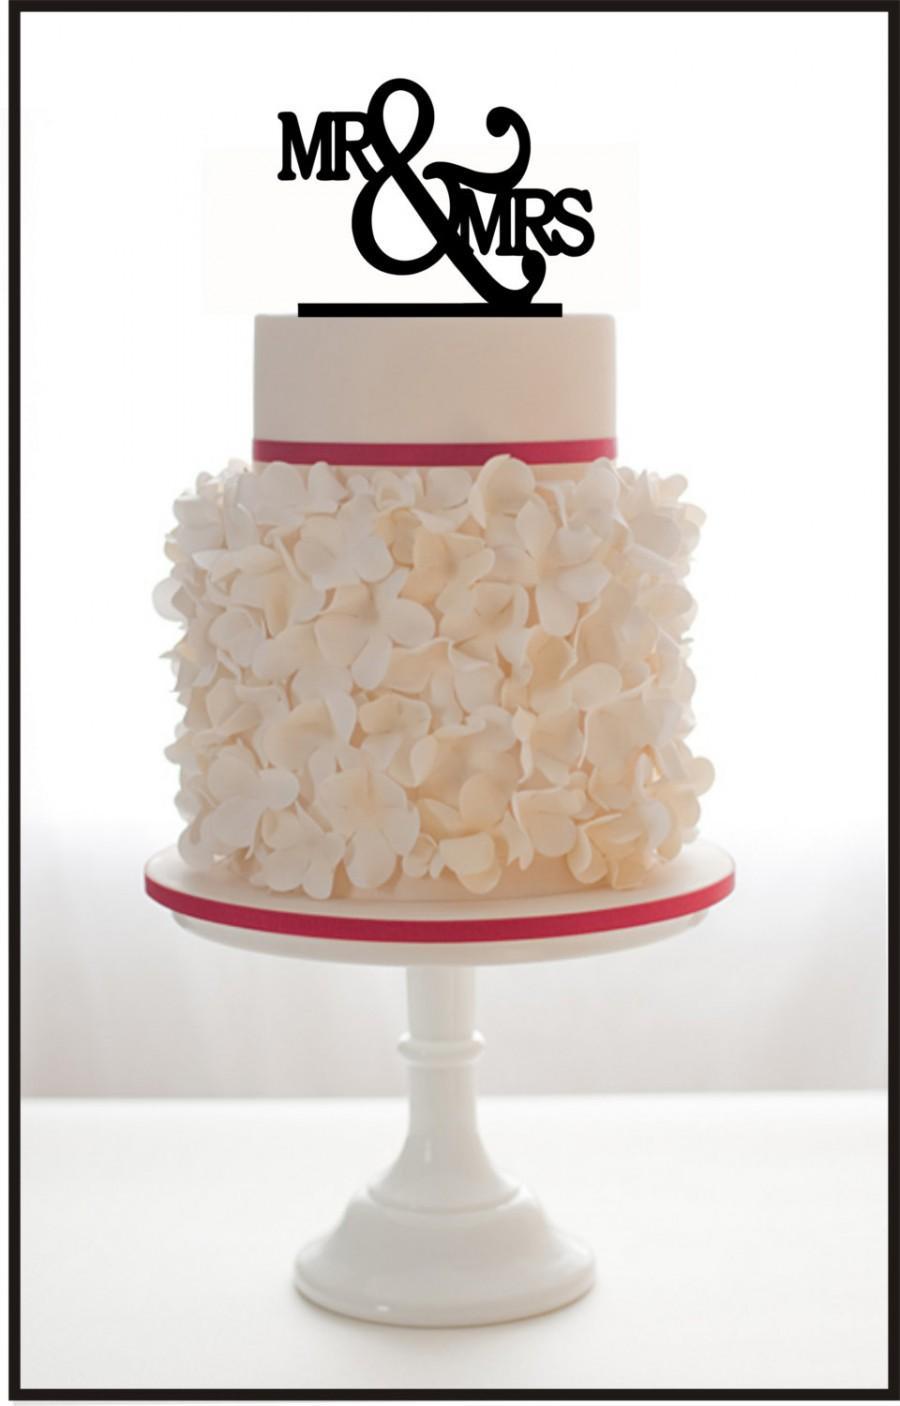 زفاف - Custom Wedding Cake Topper Mr & Mrs with choice of color and a FREE base for display